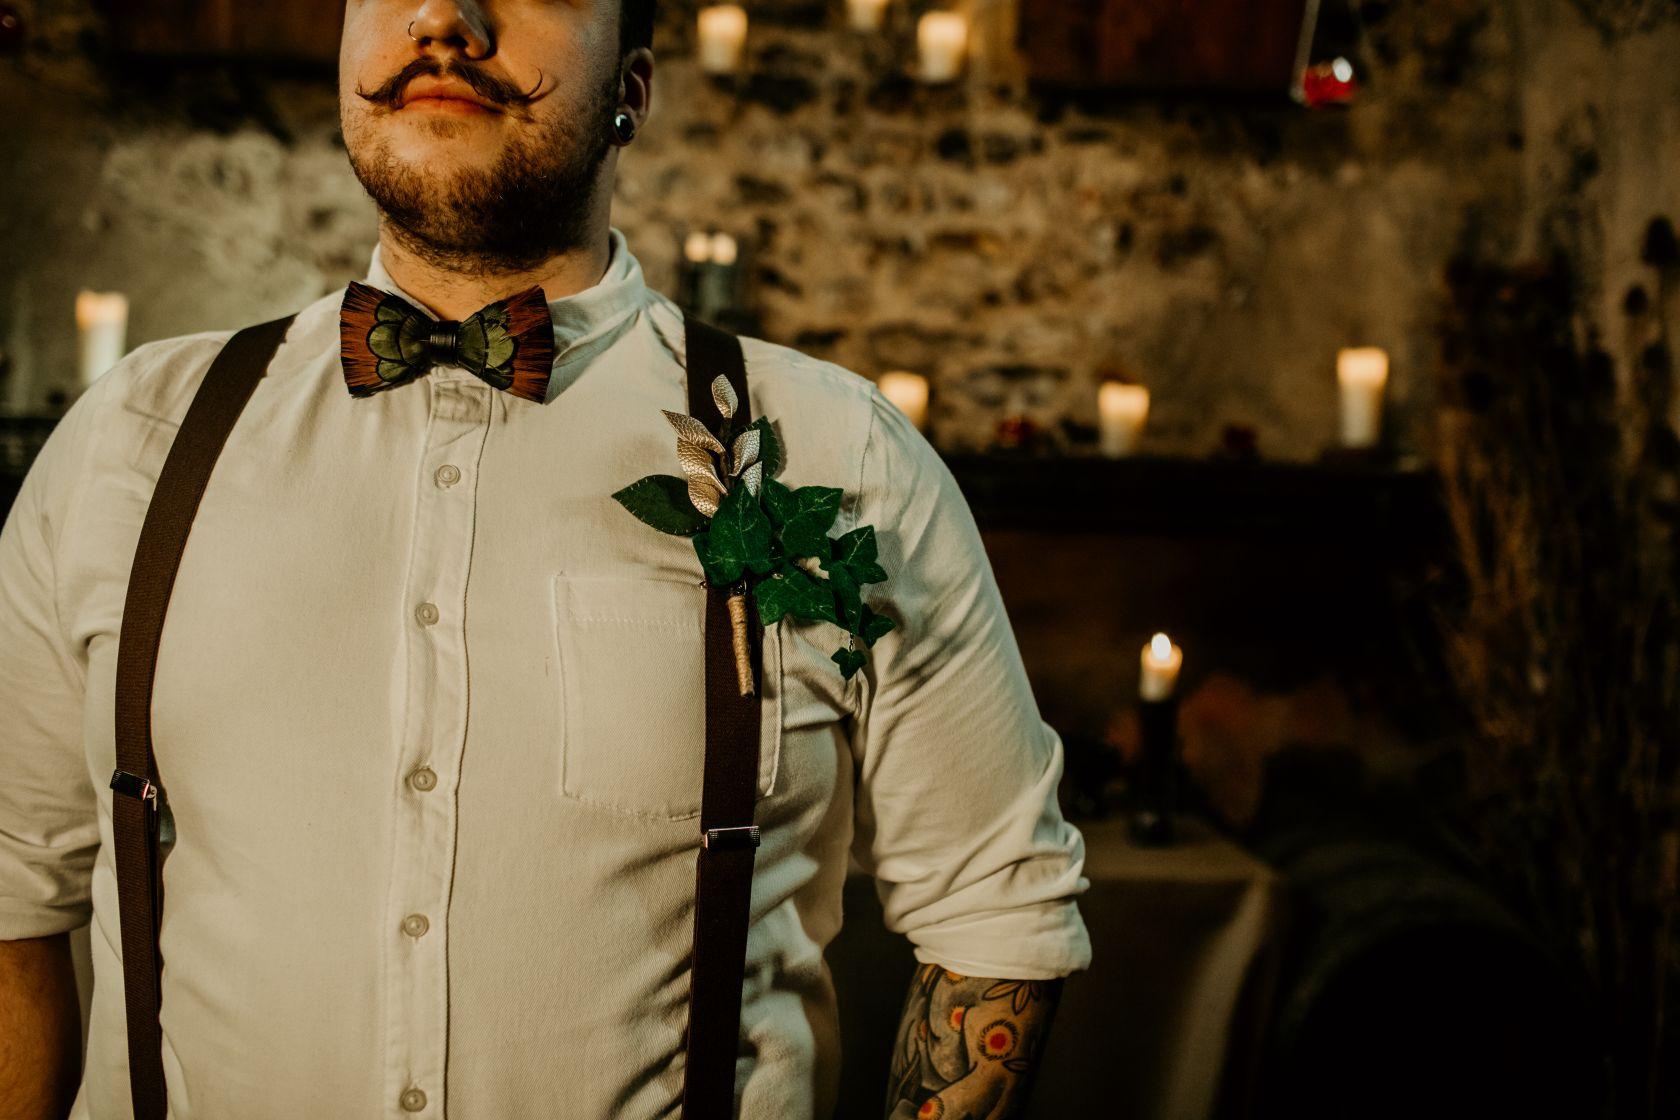 alternative fairytale wedding- snow white wedding- charlotte laurie designs-chloe mary photo- unconventional wedding- alternative wedding inspiration- bespoke wedding buttonhole